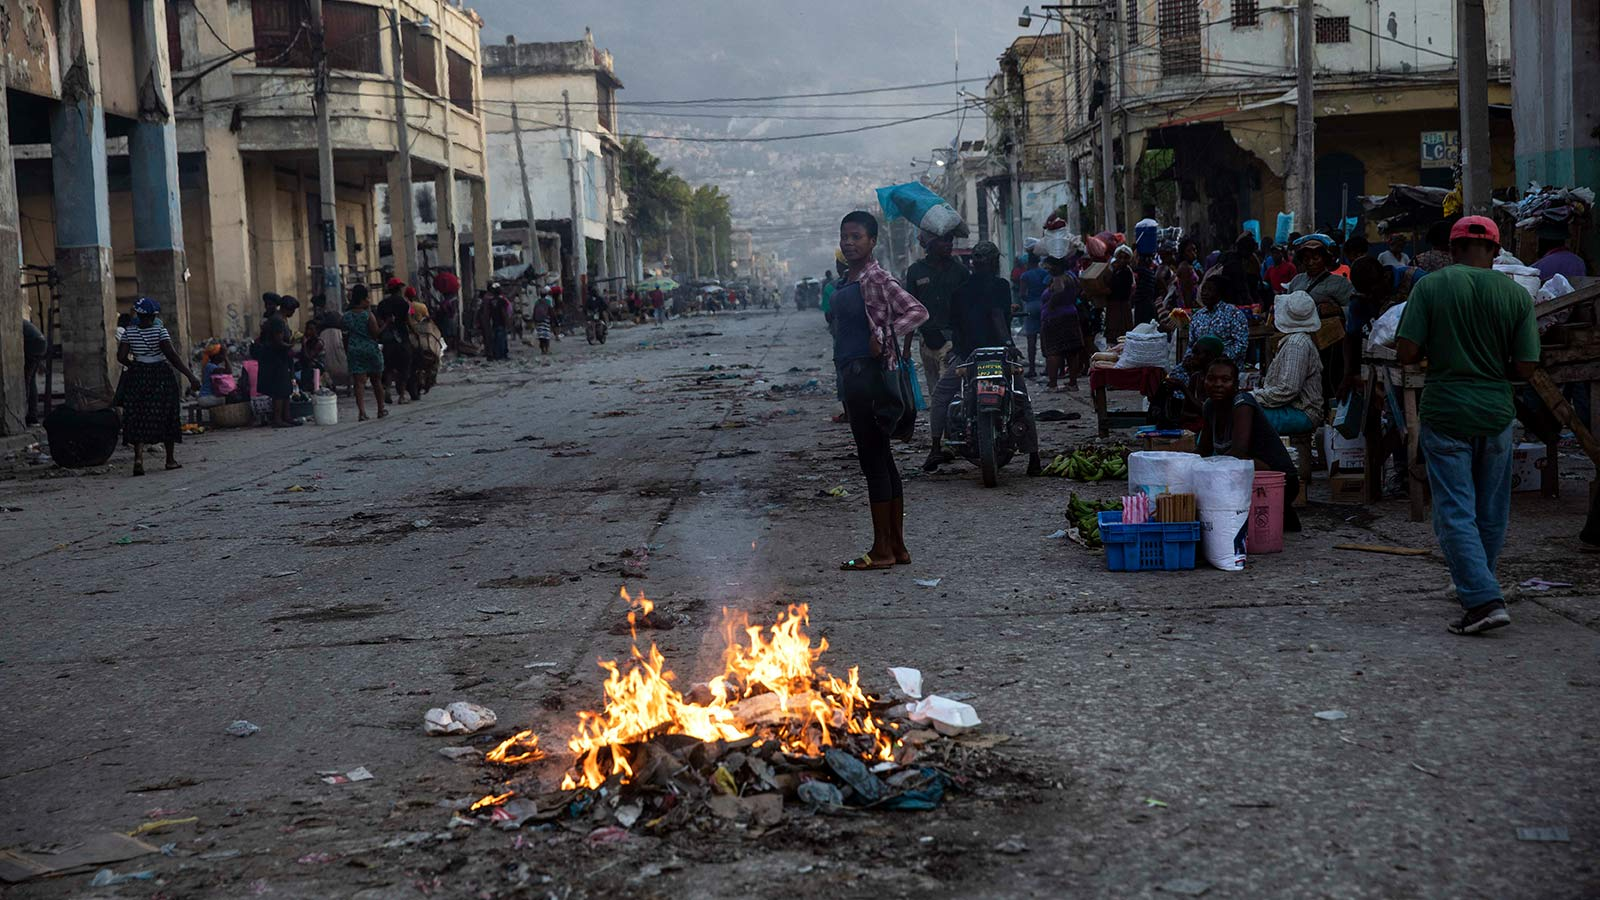 People gather around burning garbage in downtown Port-au-Prince, Haiti.